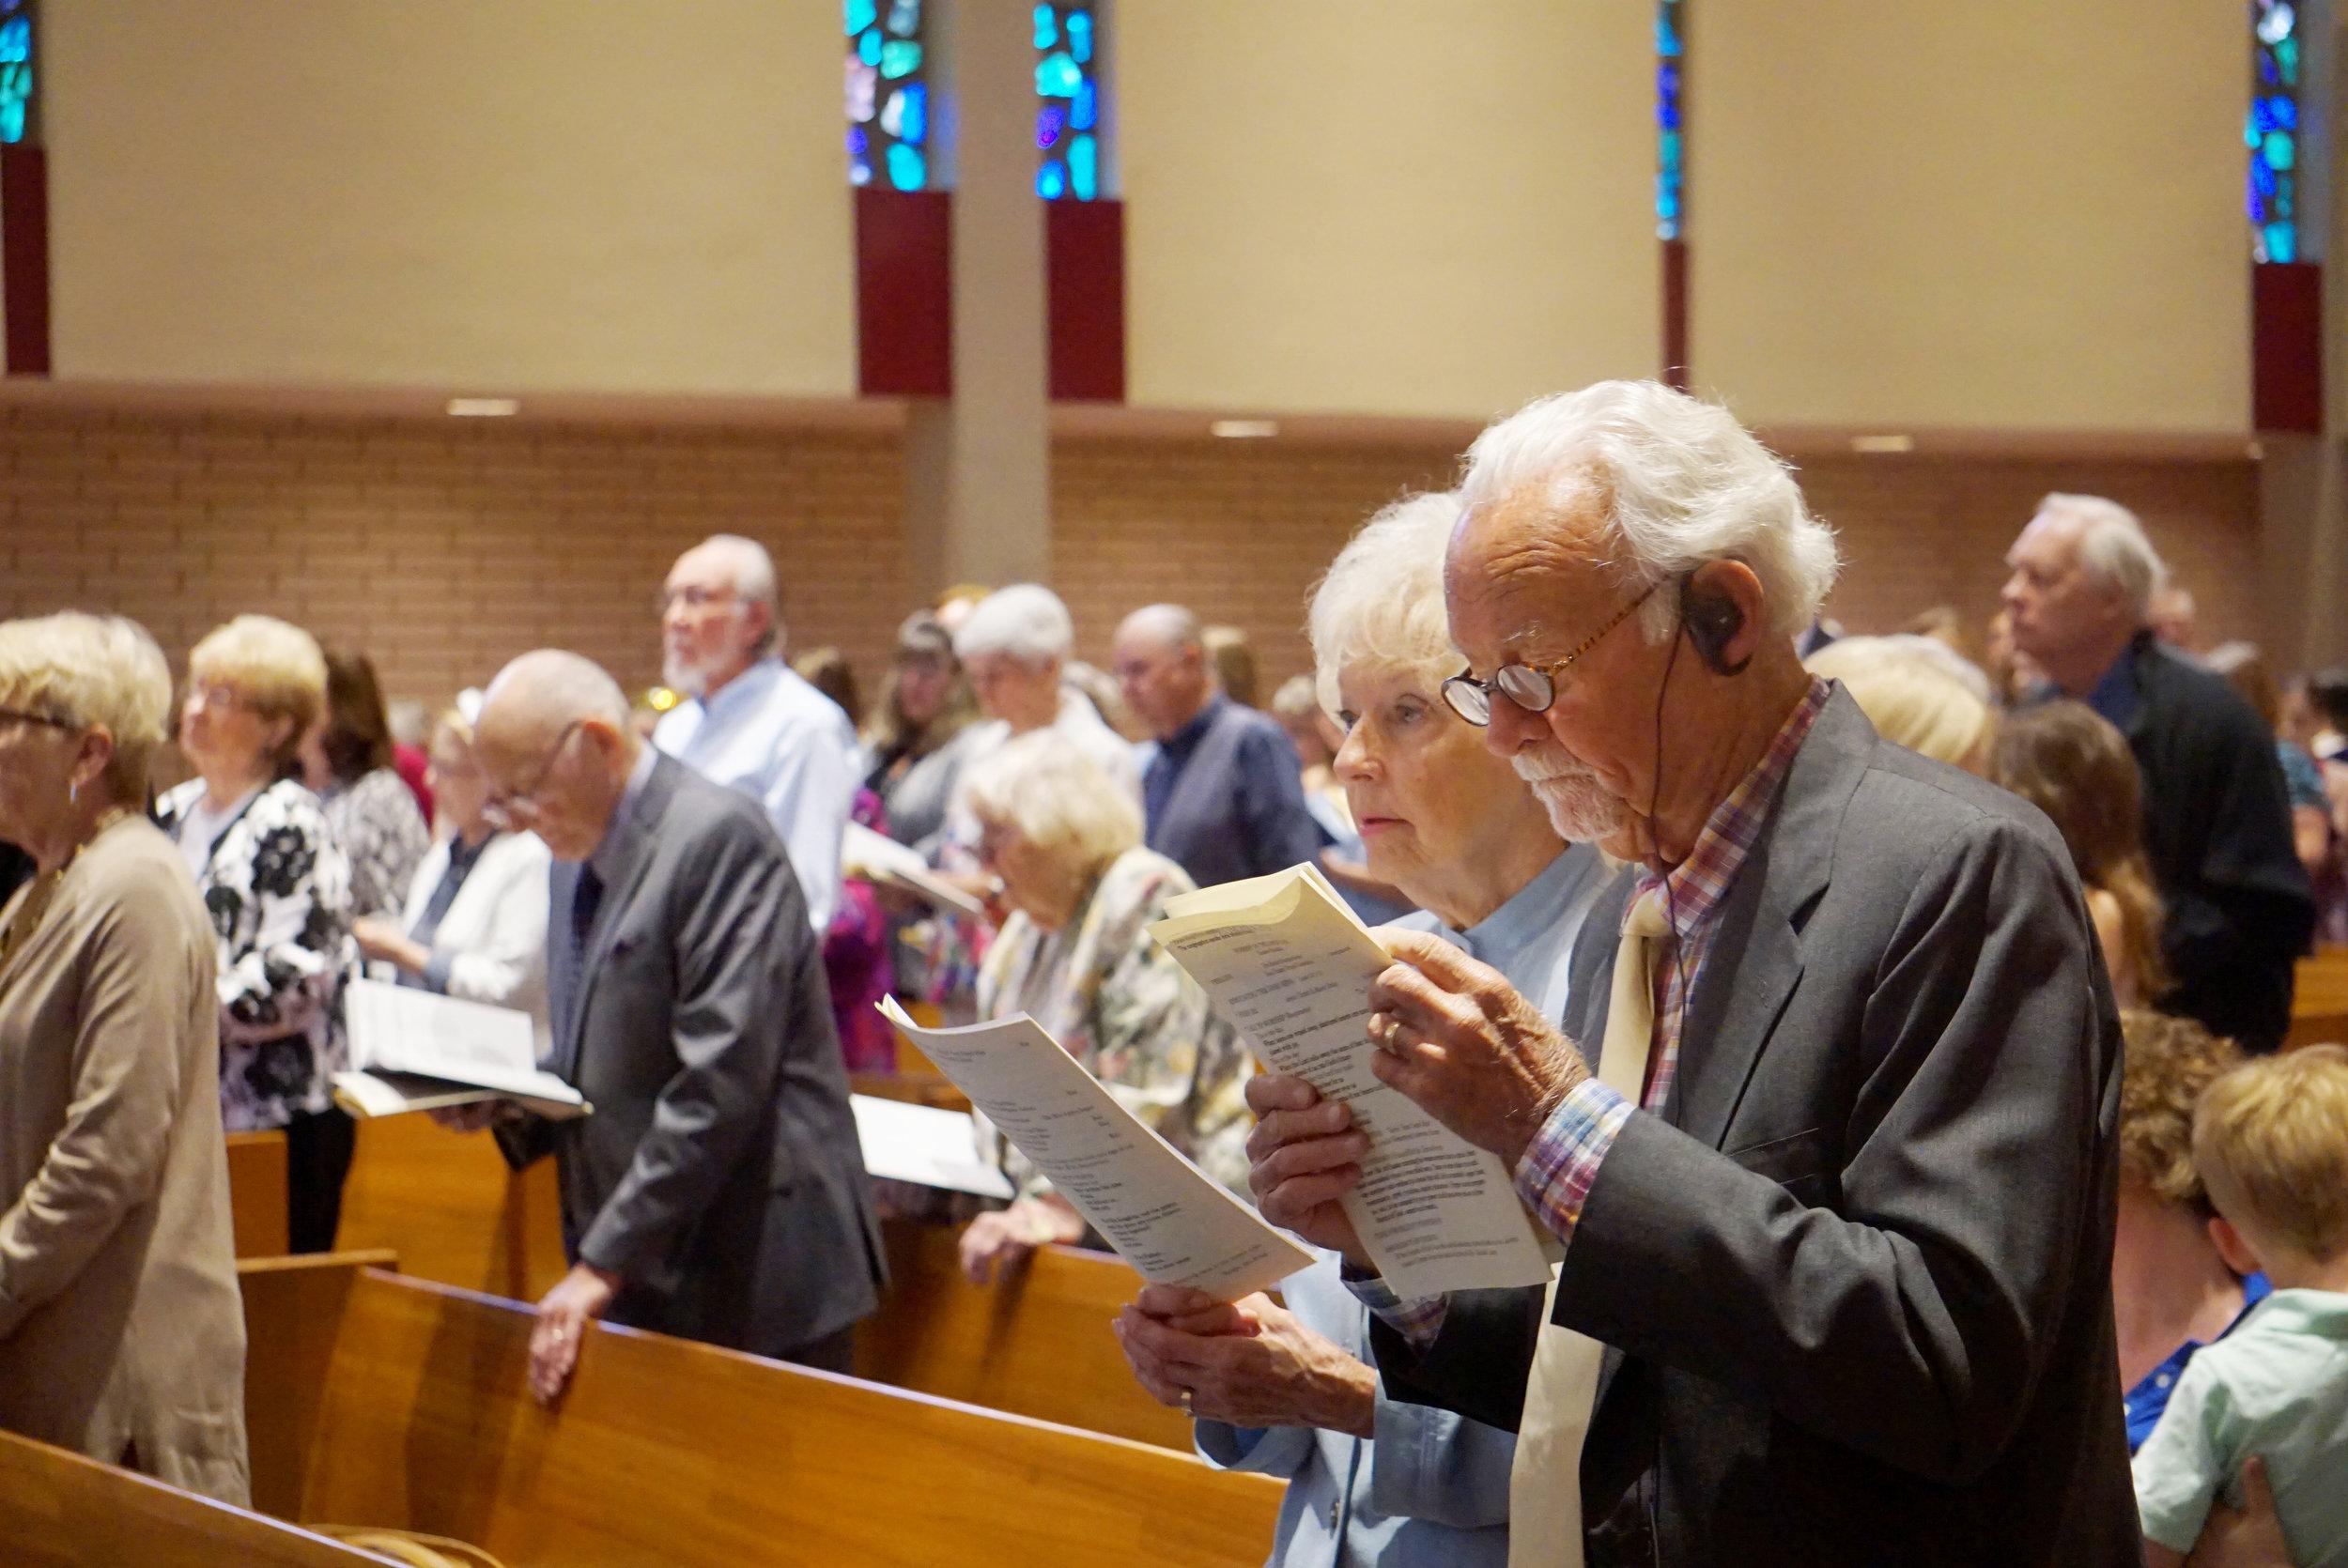 Claremont-Presbyterian-Church-congregation-4.jpg